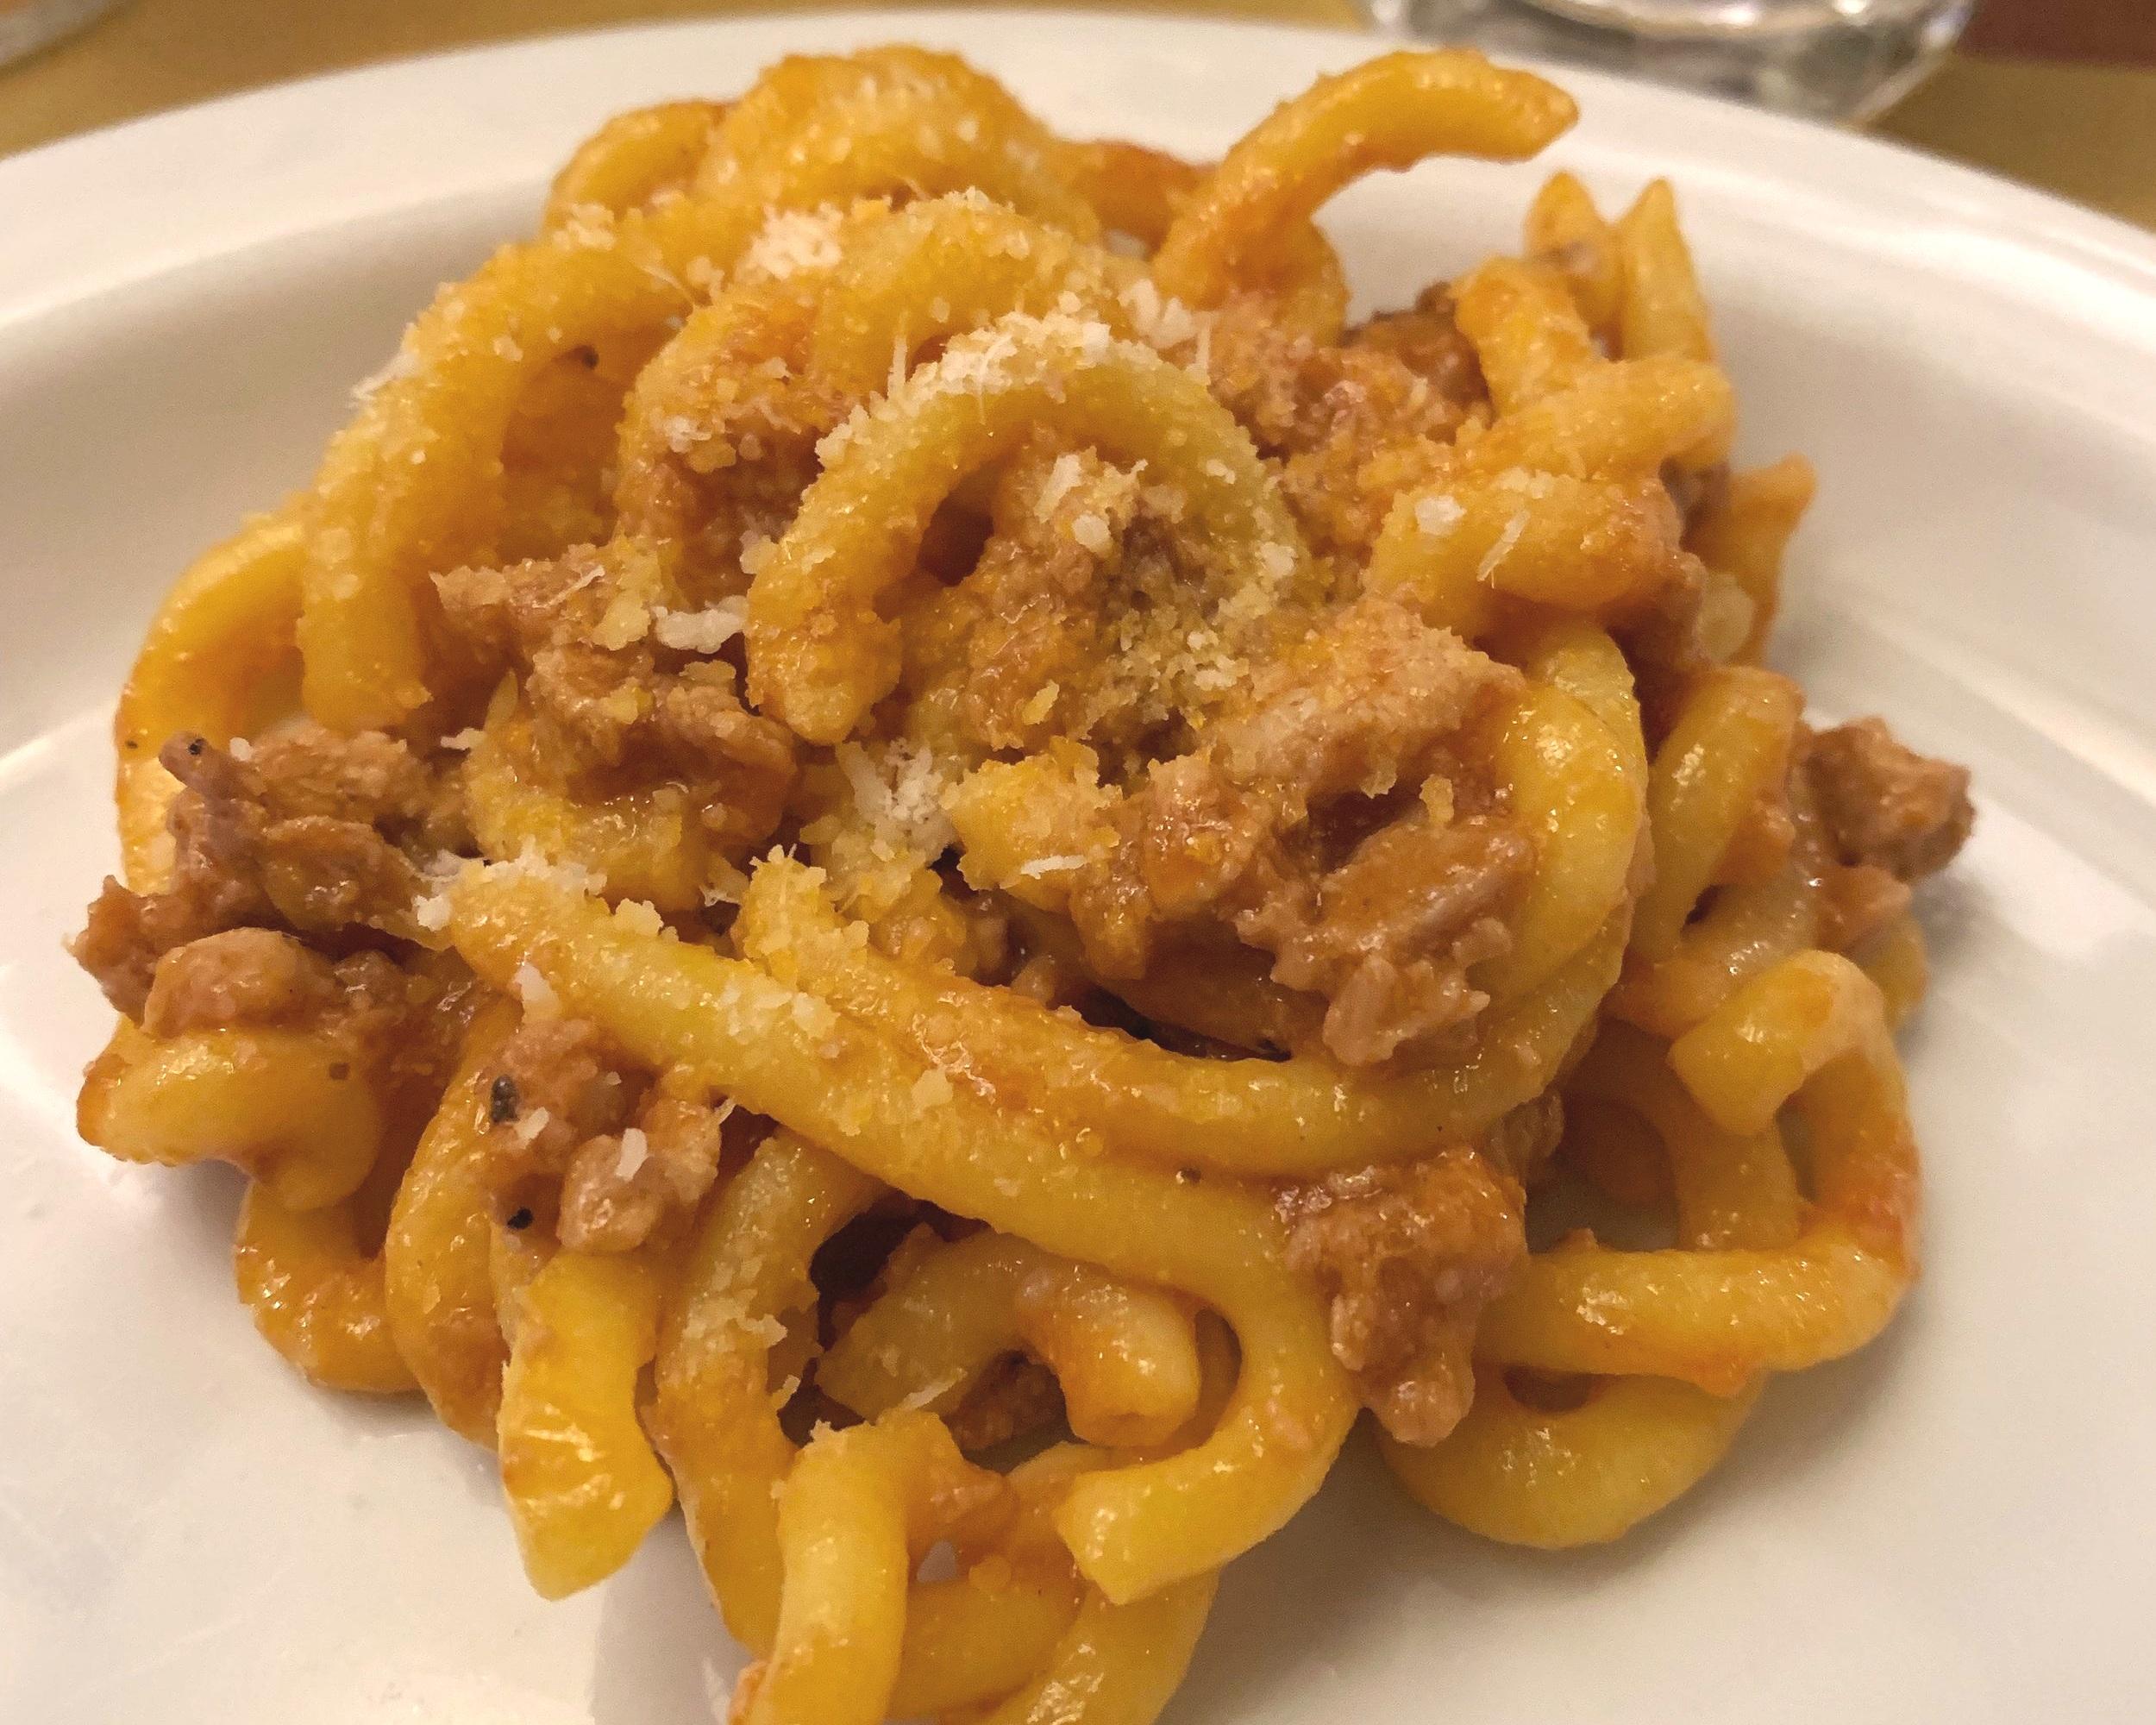 The gramigna, my favorite dish at Osteria Broccaindosso.